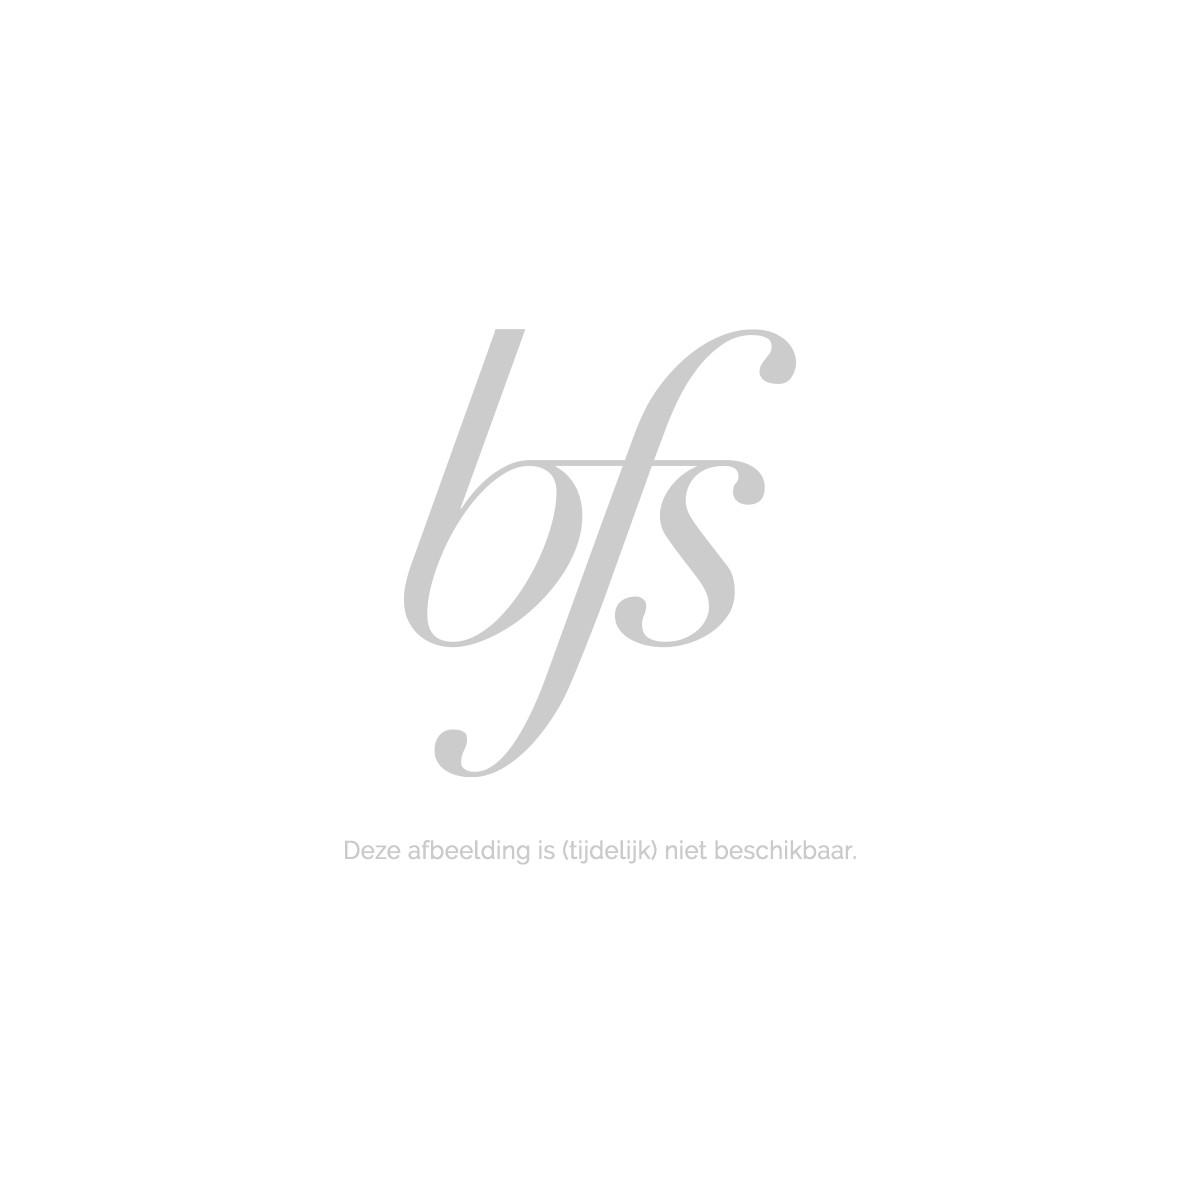 Afbeelding van Borlind Beauty Shot Hydro Booster, 15 ml